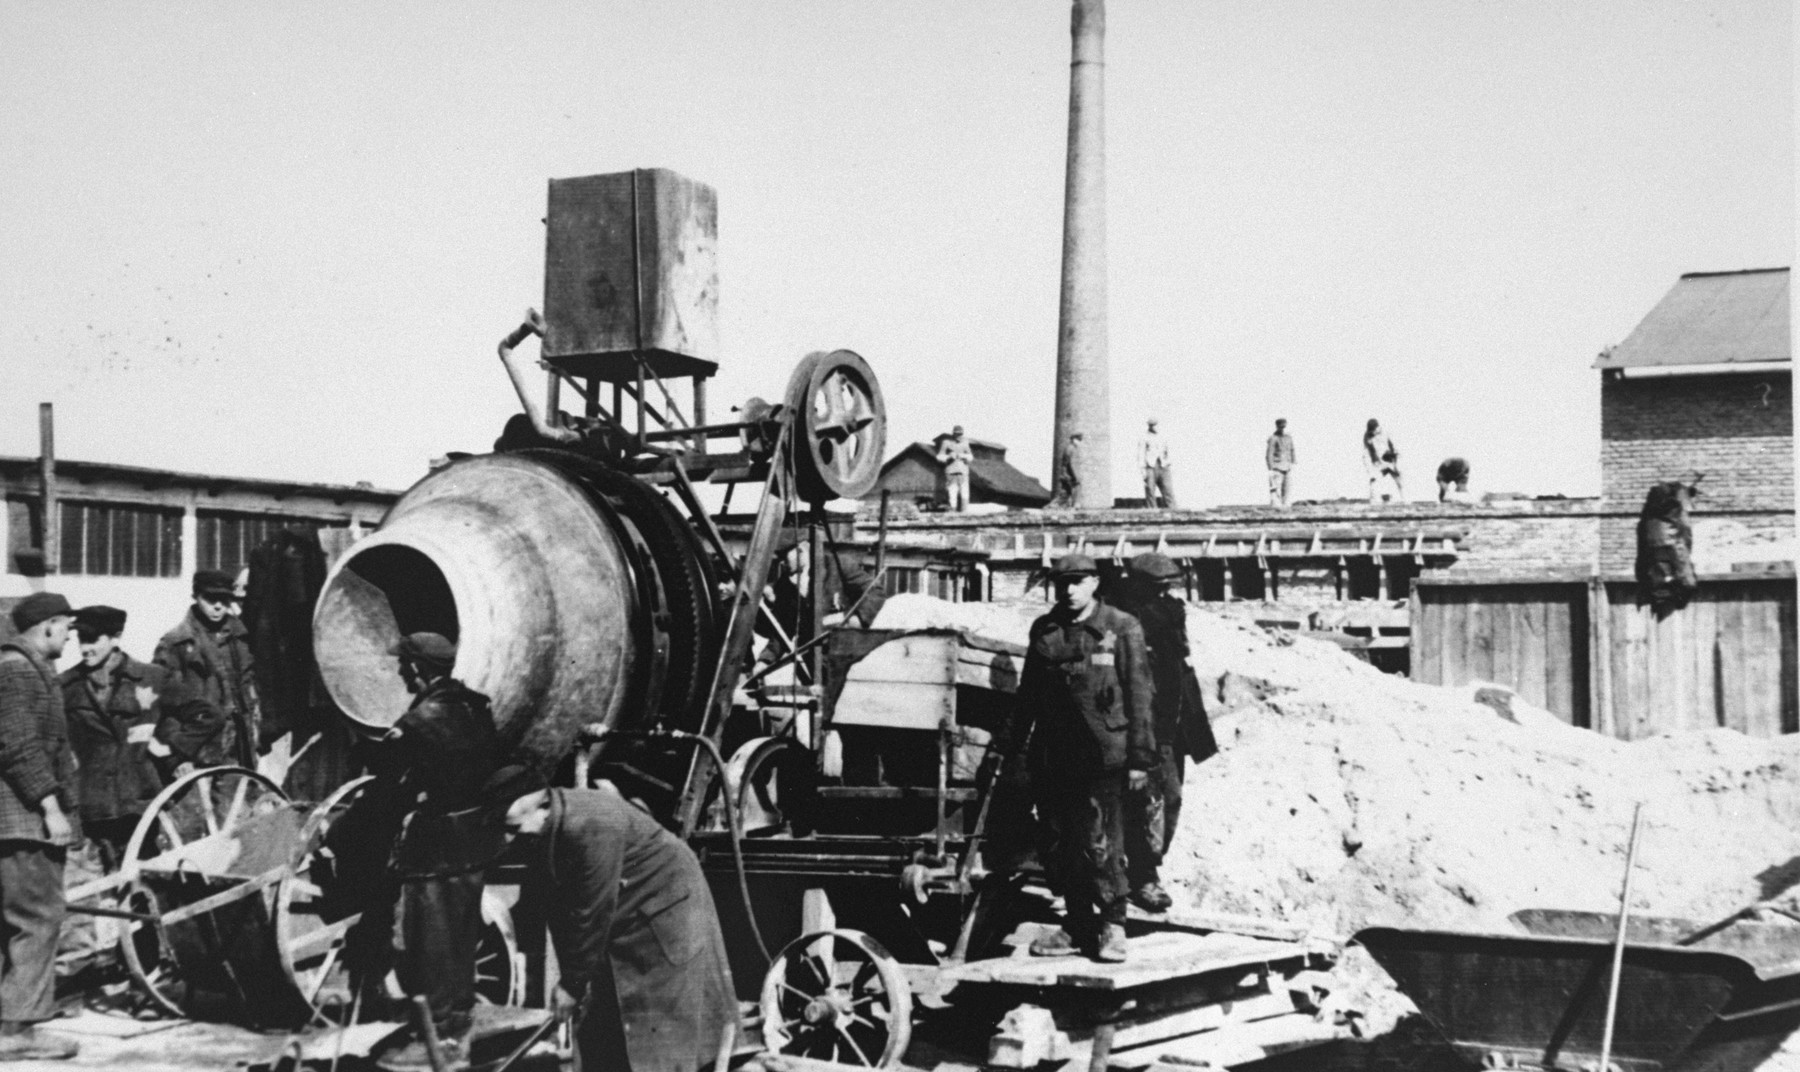 Jewish laborers at work constructing Oskar Schindler's armaments factory in Bruennlitz.